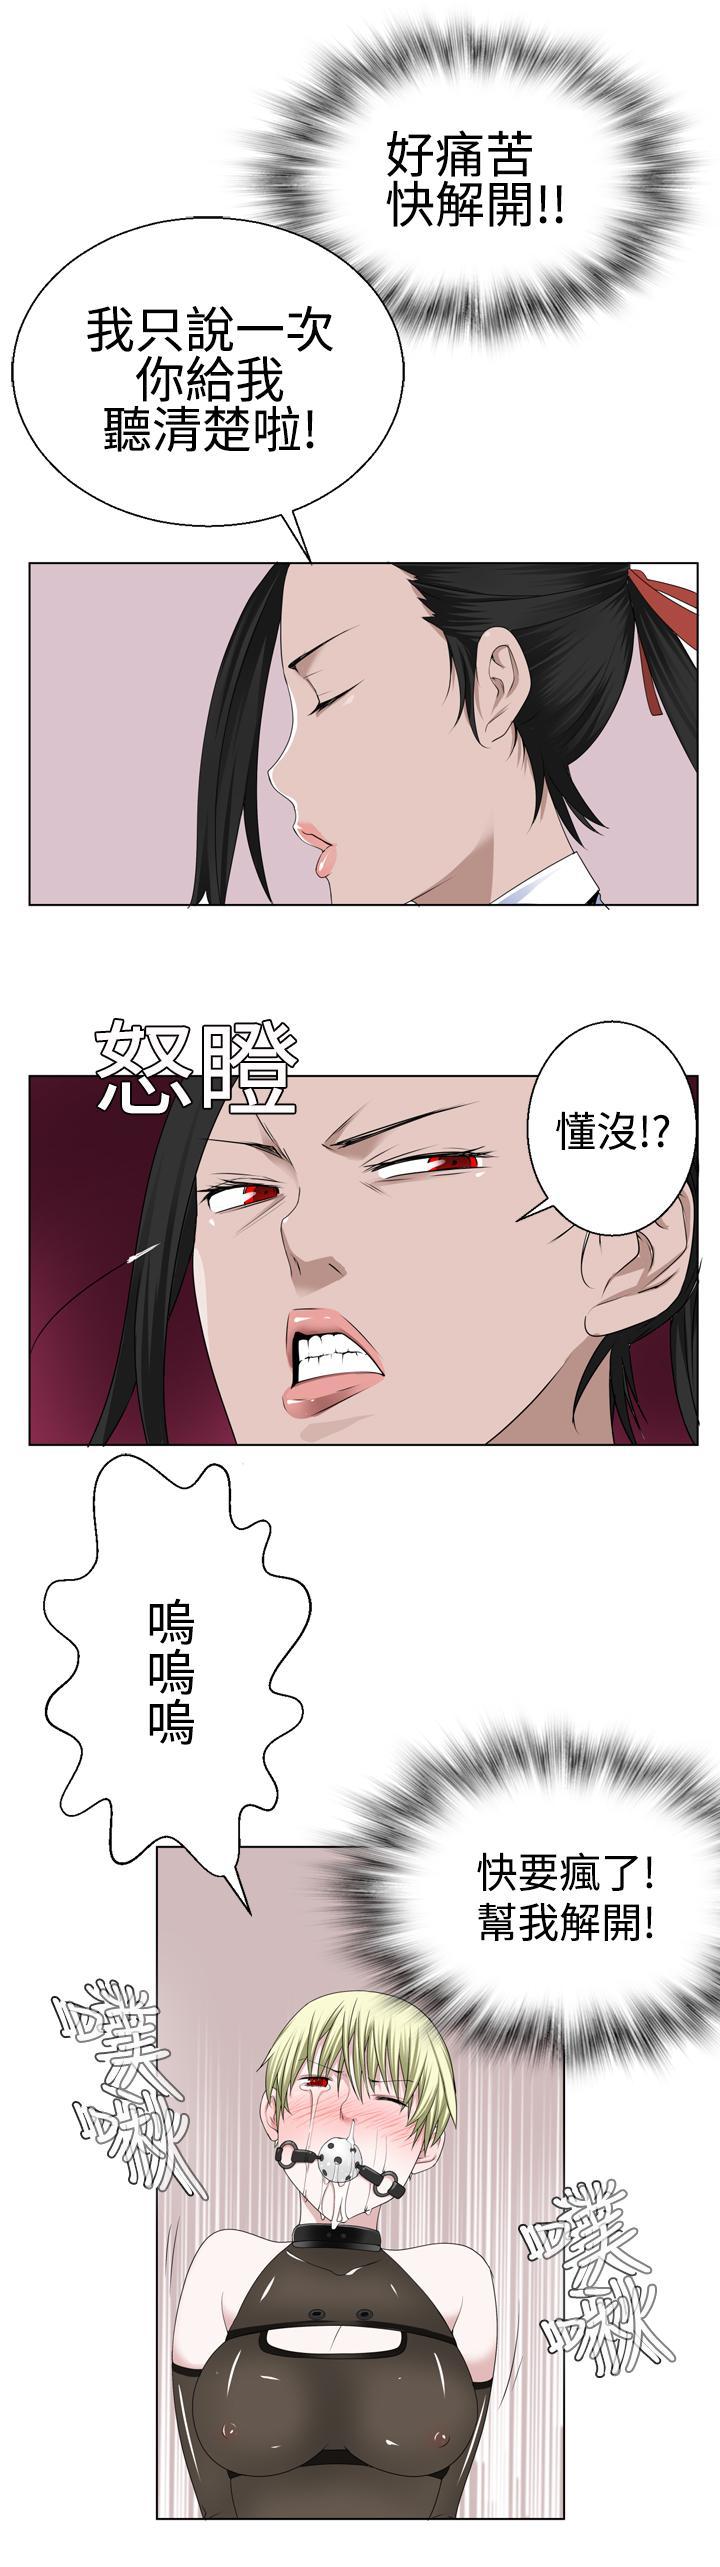 [SOSO] Franken Jo 为爱而生 法兰克赵 Ch.1~19 [Chinese]中文 316